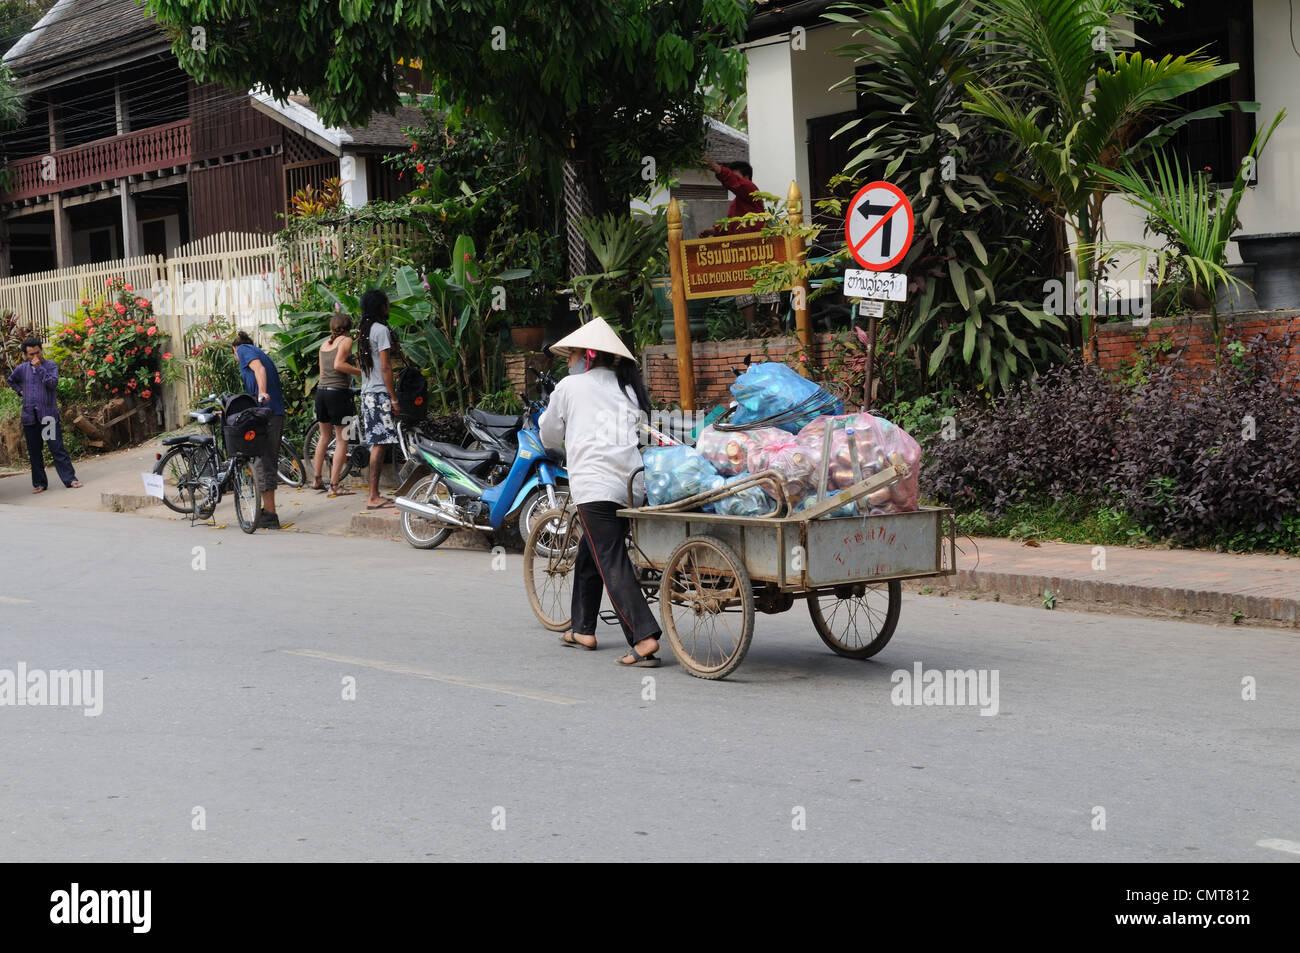 Lao woman  using a bicycle and cart to collect garbage  Luang Prabang Laos - Stock Image